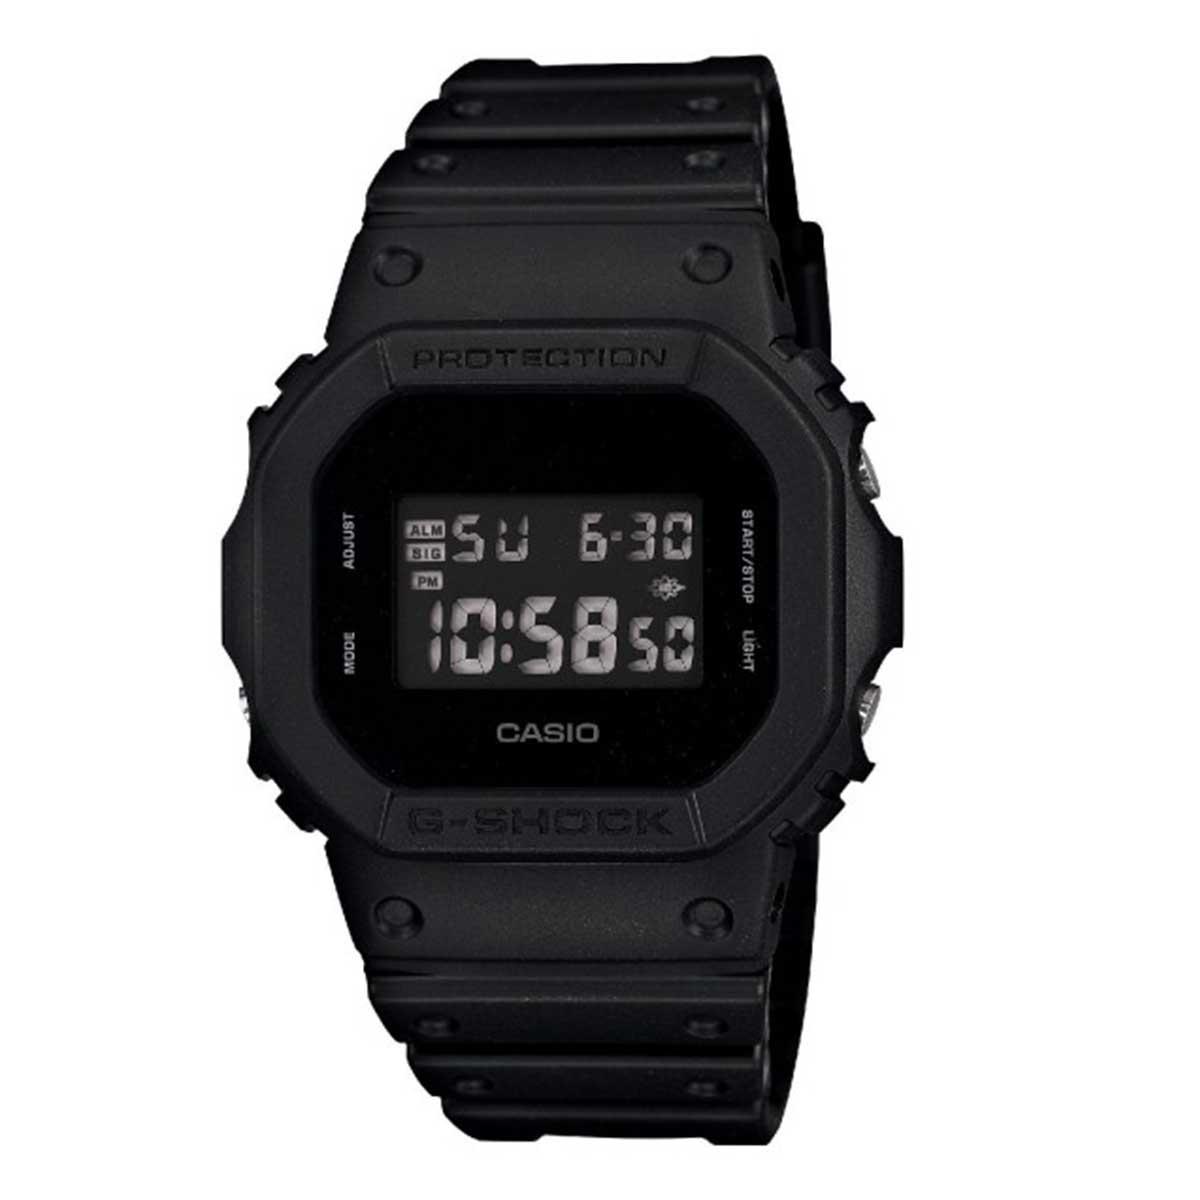 Relógio de Pulso Casio G-Shock Digital Modelo DW-5600BB-1DR